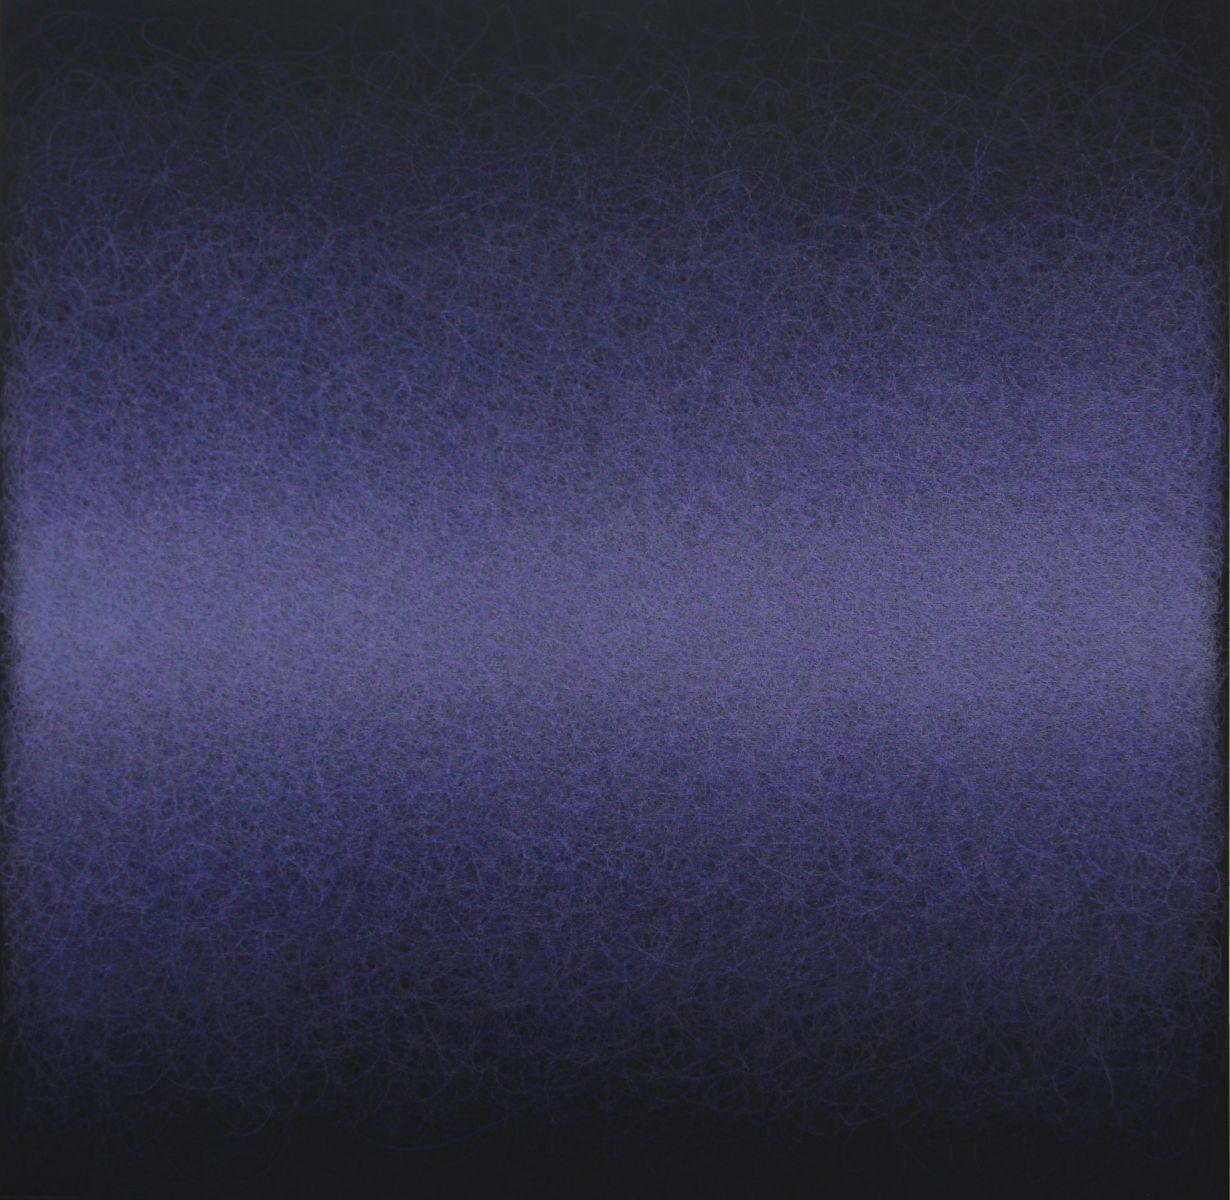 Quantum Entanglement (Violet 2)